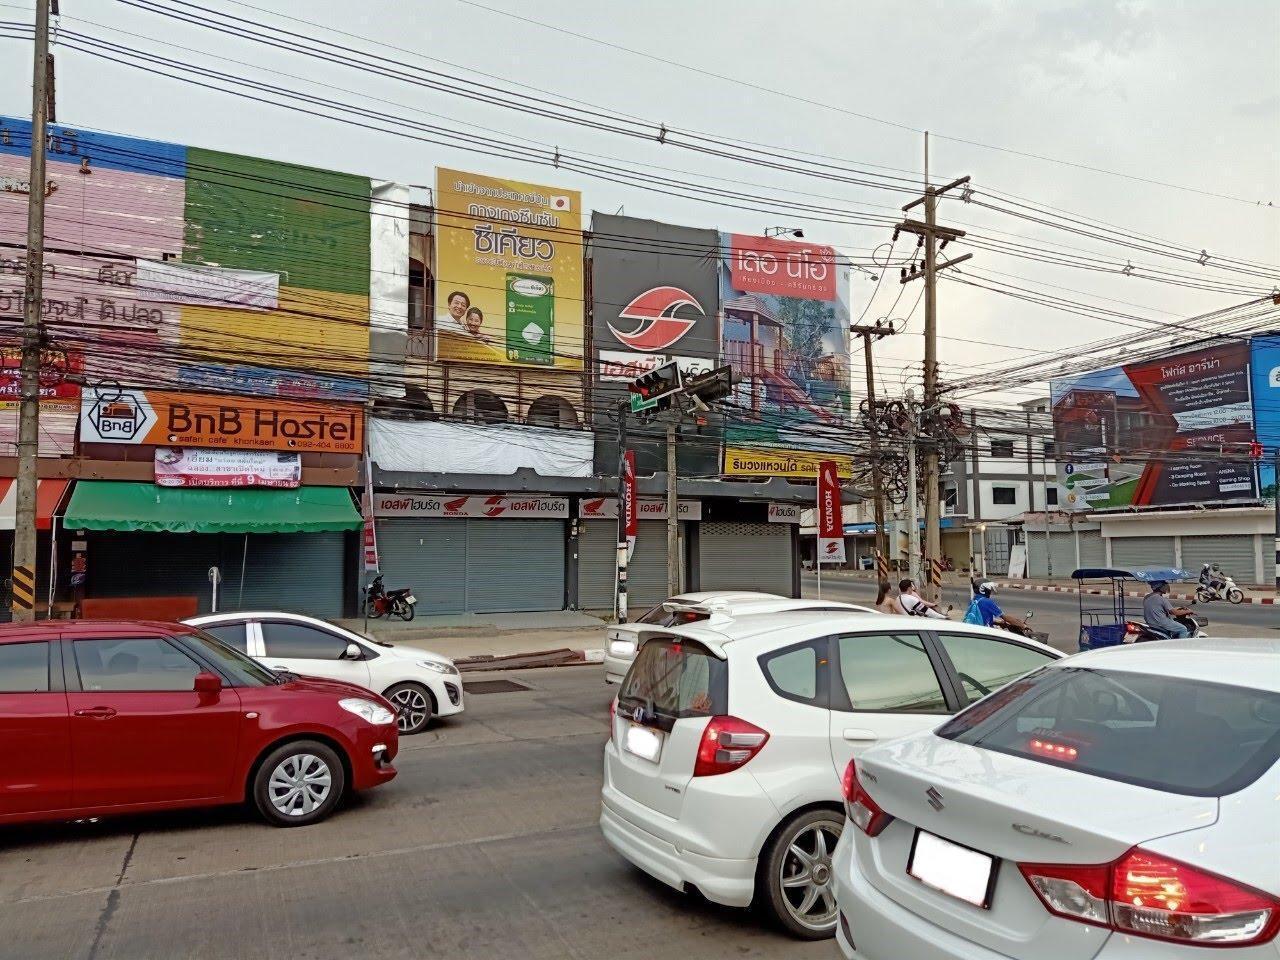 BnB Hostel Khon Kaen บีแอนด์บี โฮสเทล ขอนแก่น